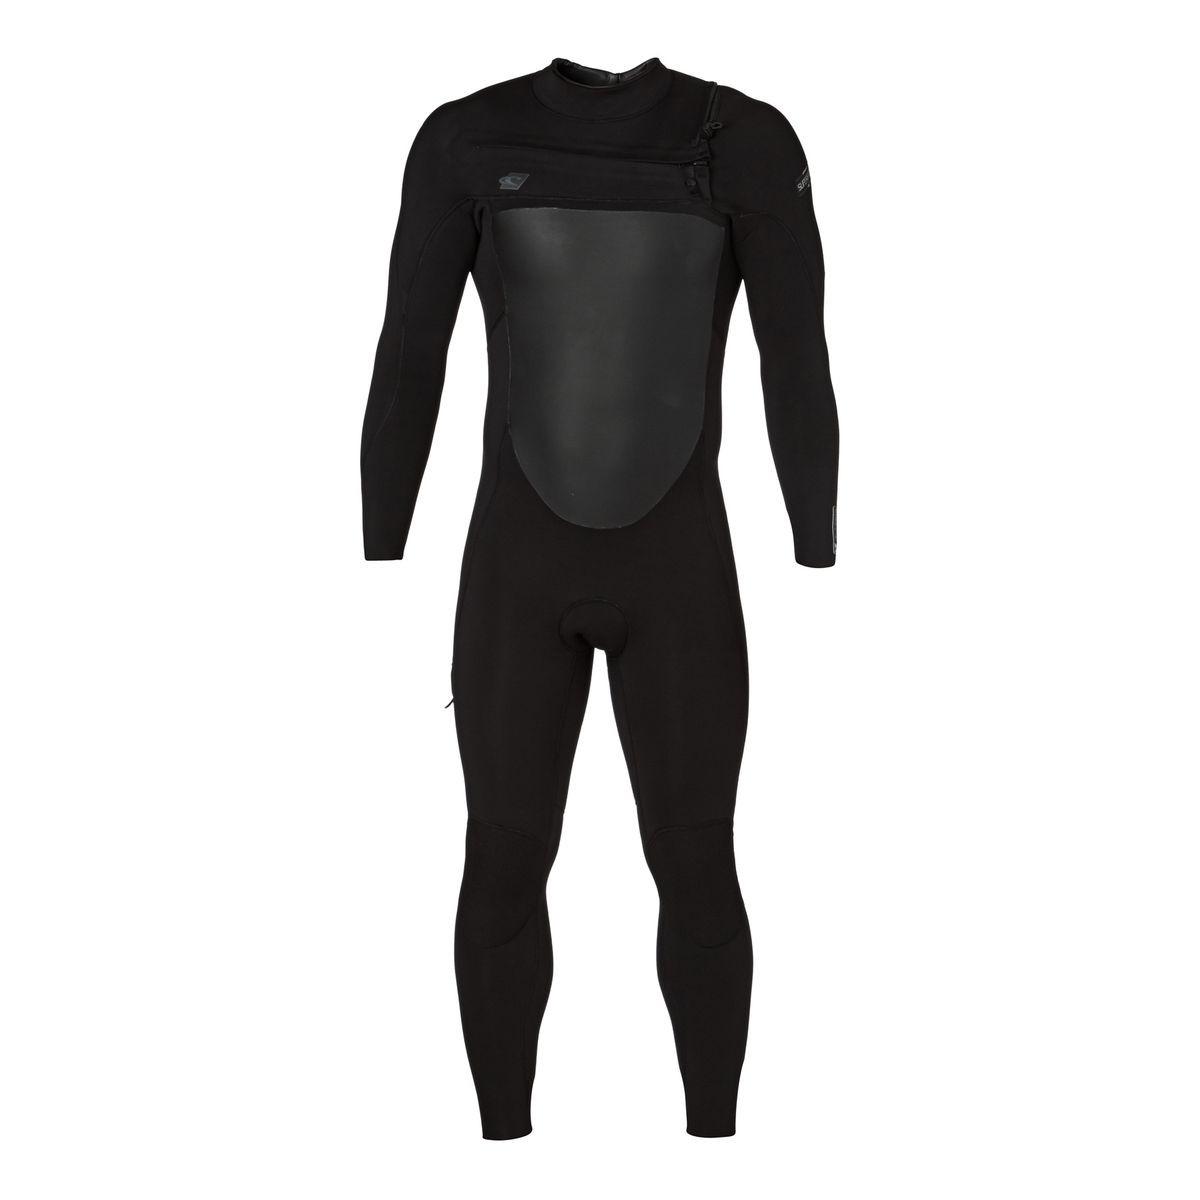 O'Neill Superfreak 5/4mm 2017 Chest Zip Wetsuit - Black/ Black/ Black